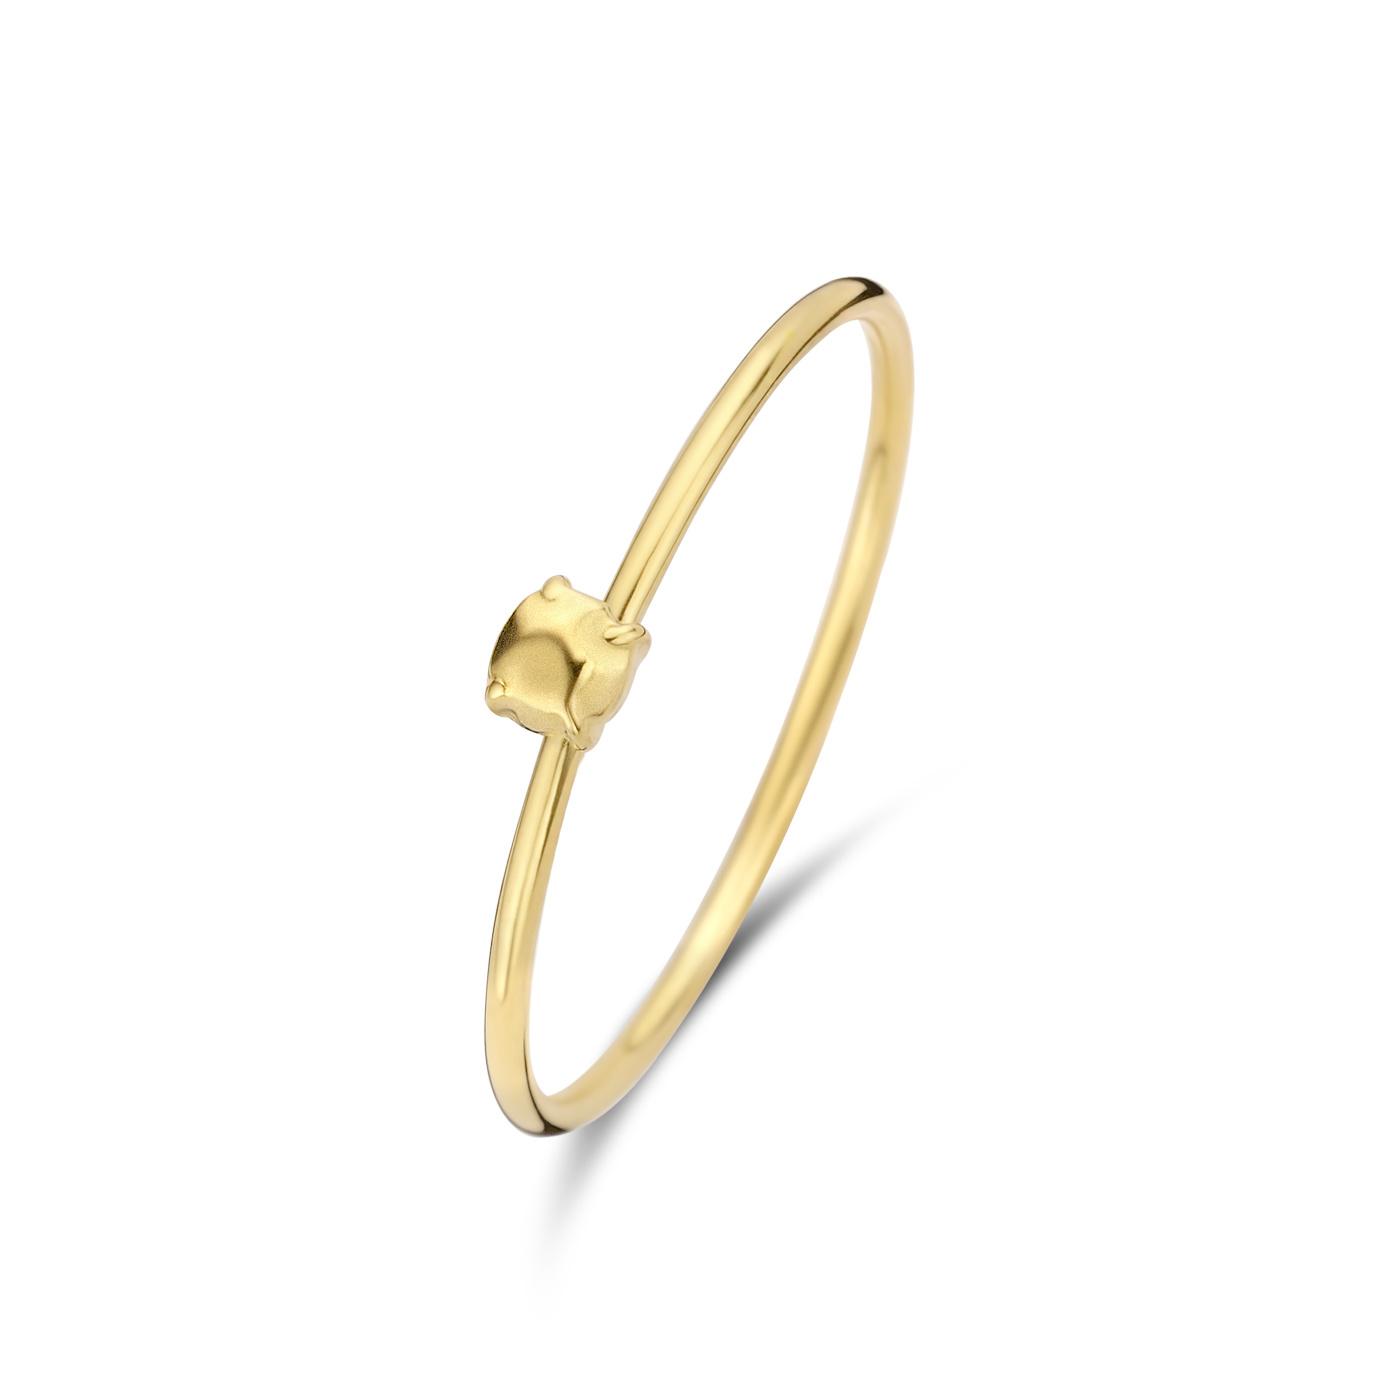 Violet Hamden Sisterhood 925 sterlingsølv guldfarvet ring